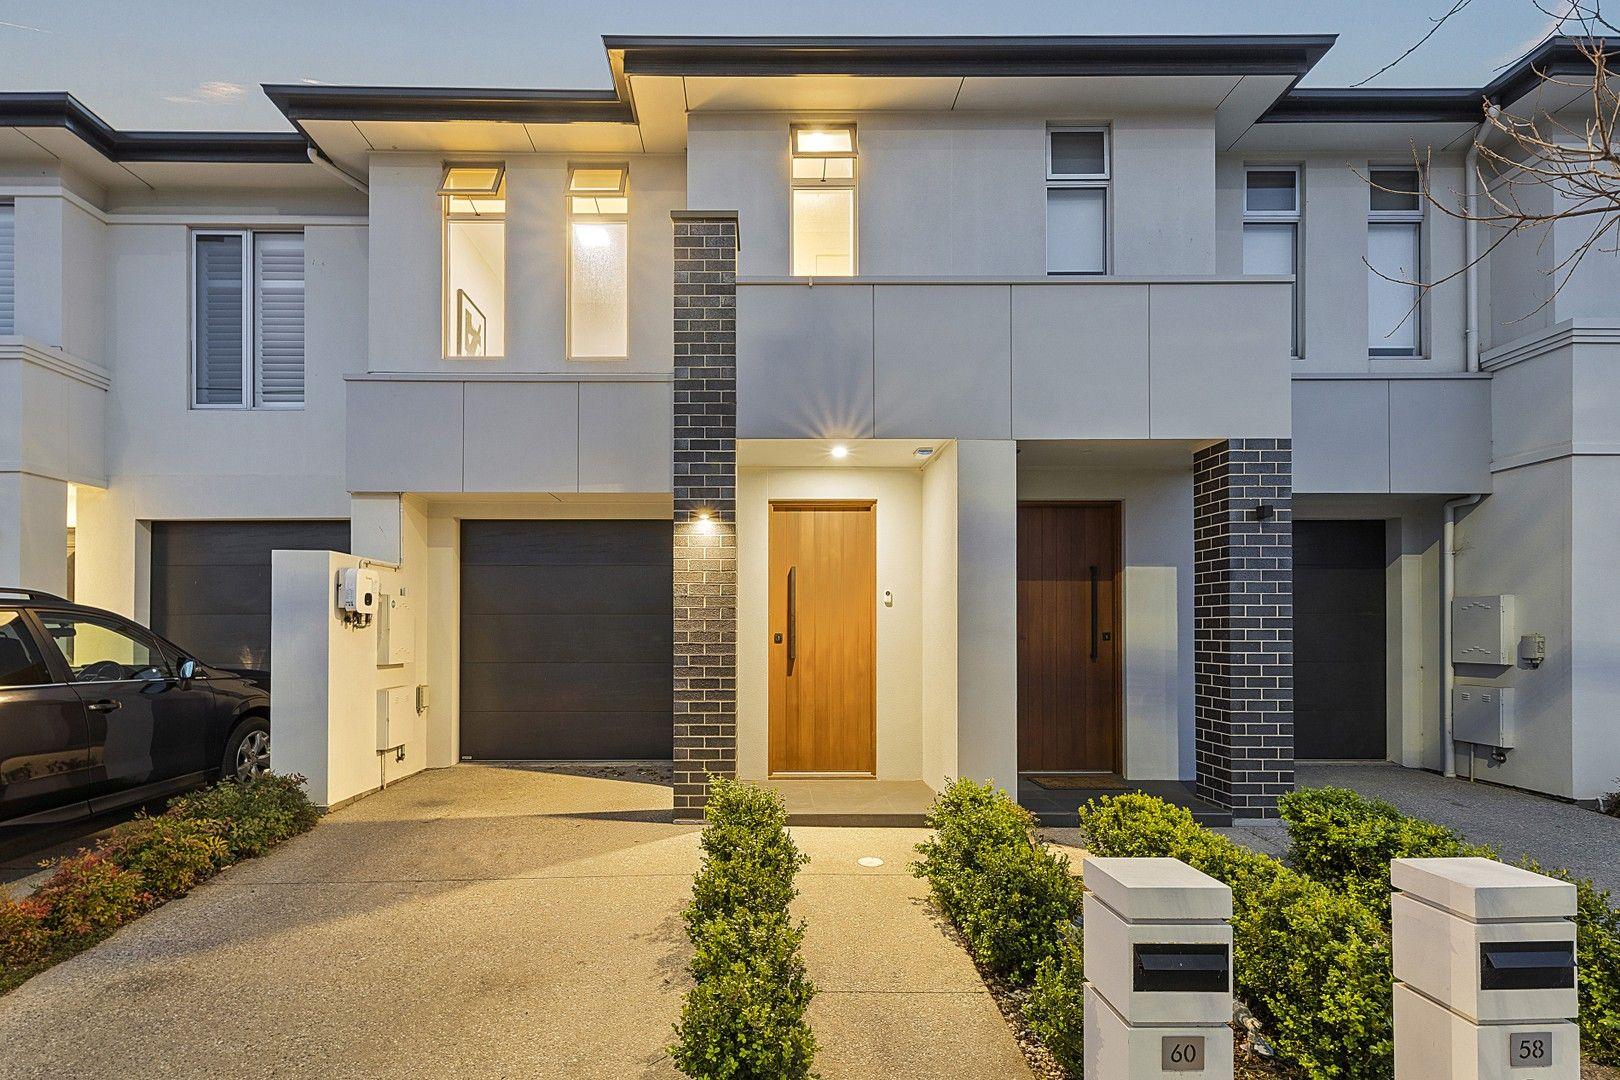 3 bedrooms House in 60 Boss Avenue MARLESTON SA, 5033